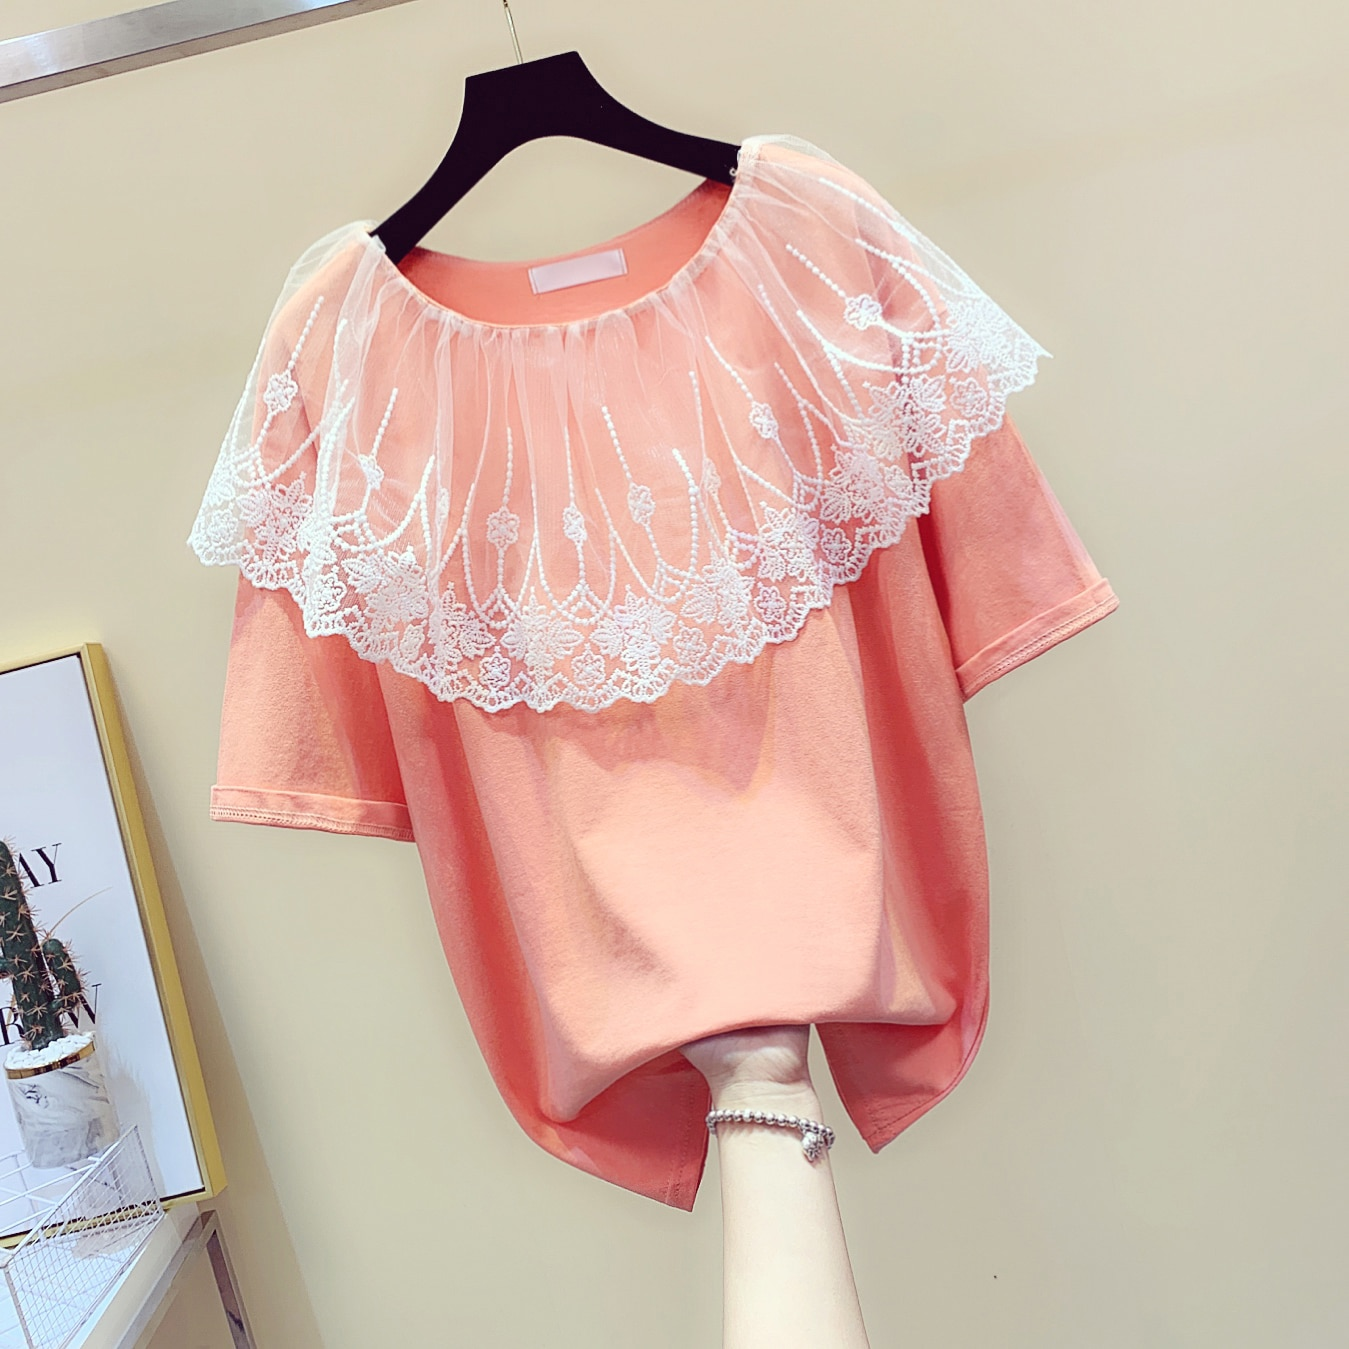 Swee Cloak escote con volantes de manga corta Top mujer malla empalmada cuello redondo suelta verano camiseta chica estudiantes camisetas de algodón